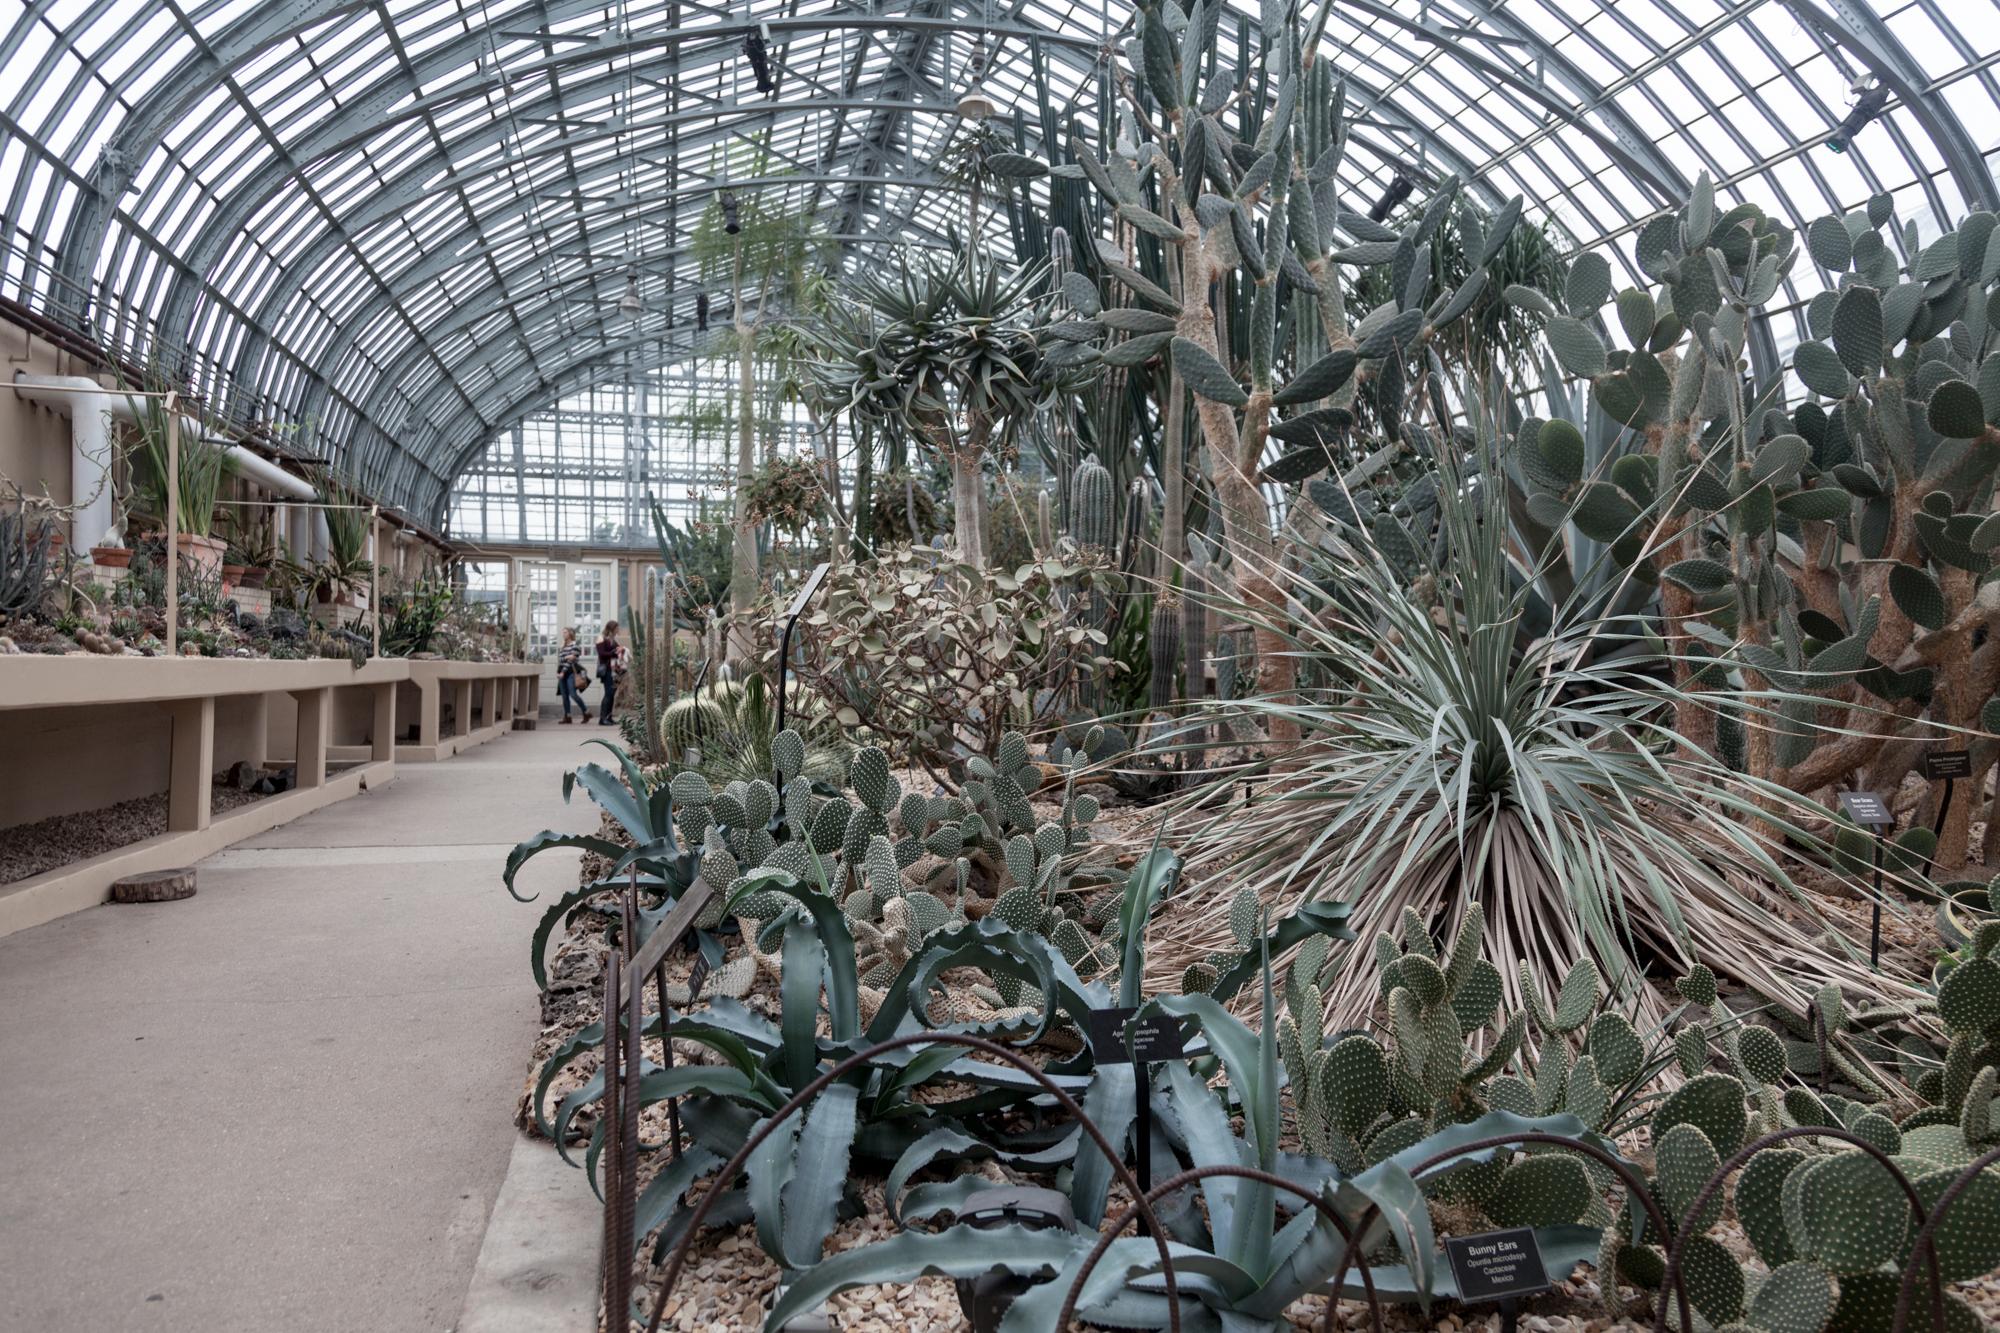 Cacnti-Room-Garfield-Park-Conservatory.jpg